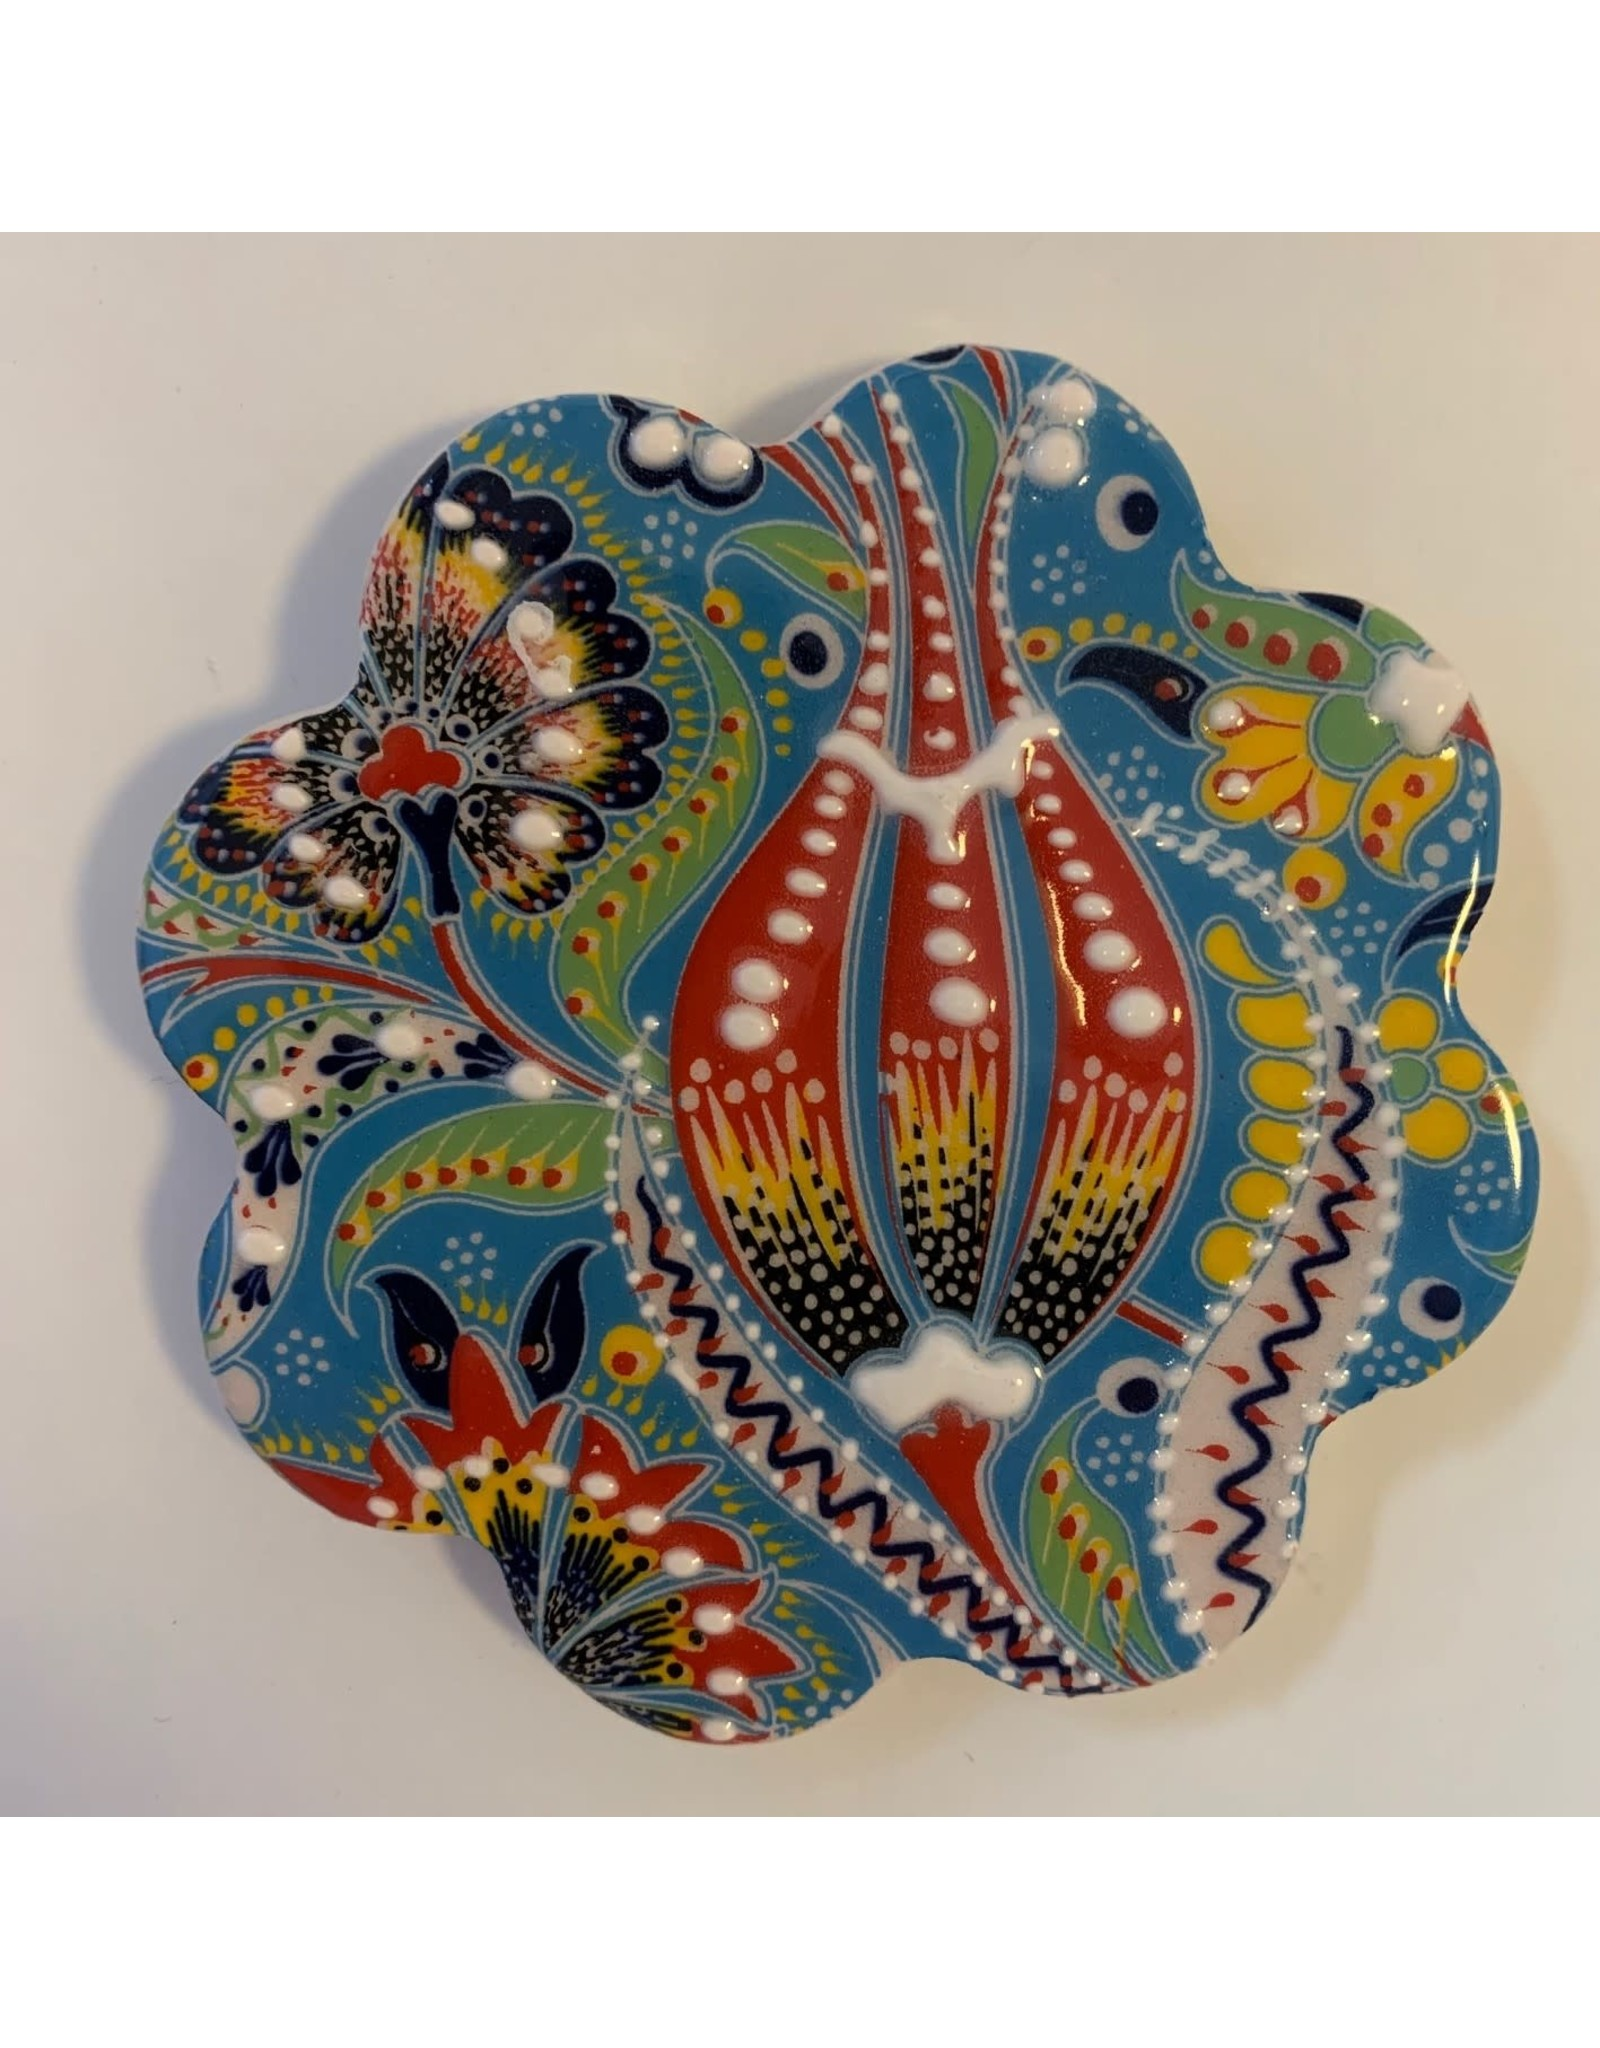 Hand Painted Relief Ceramic Coaster, Blue